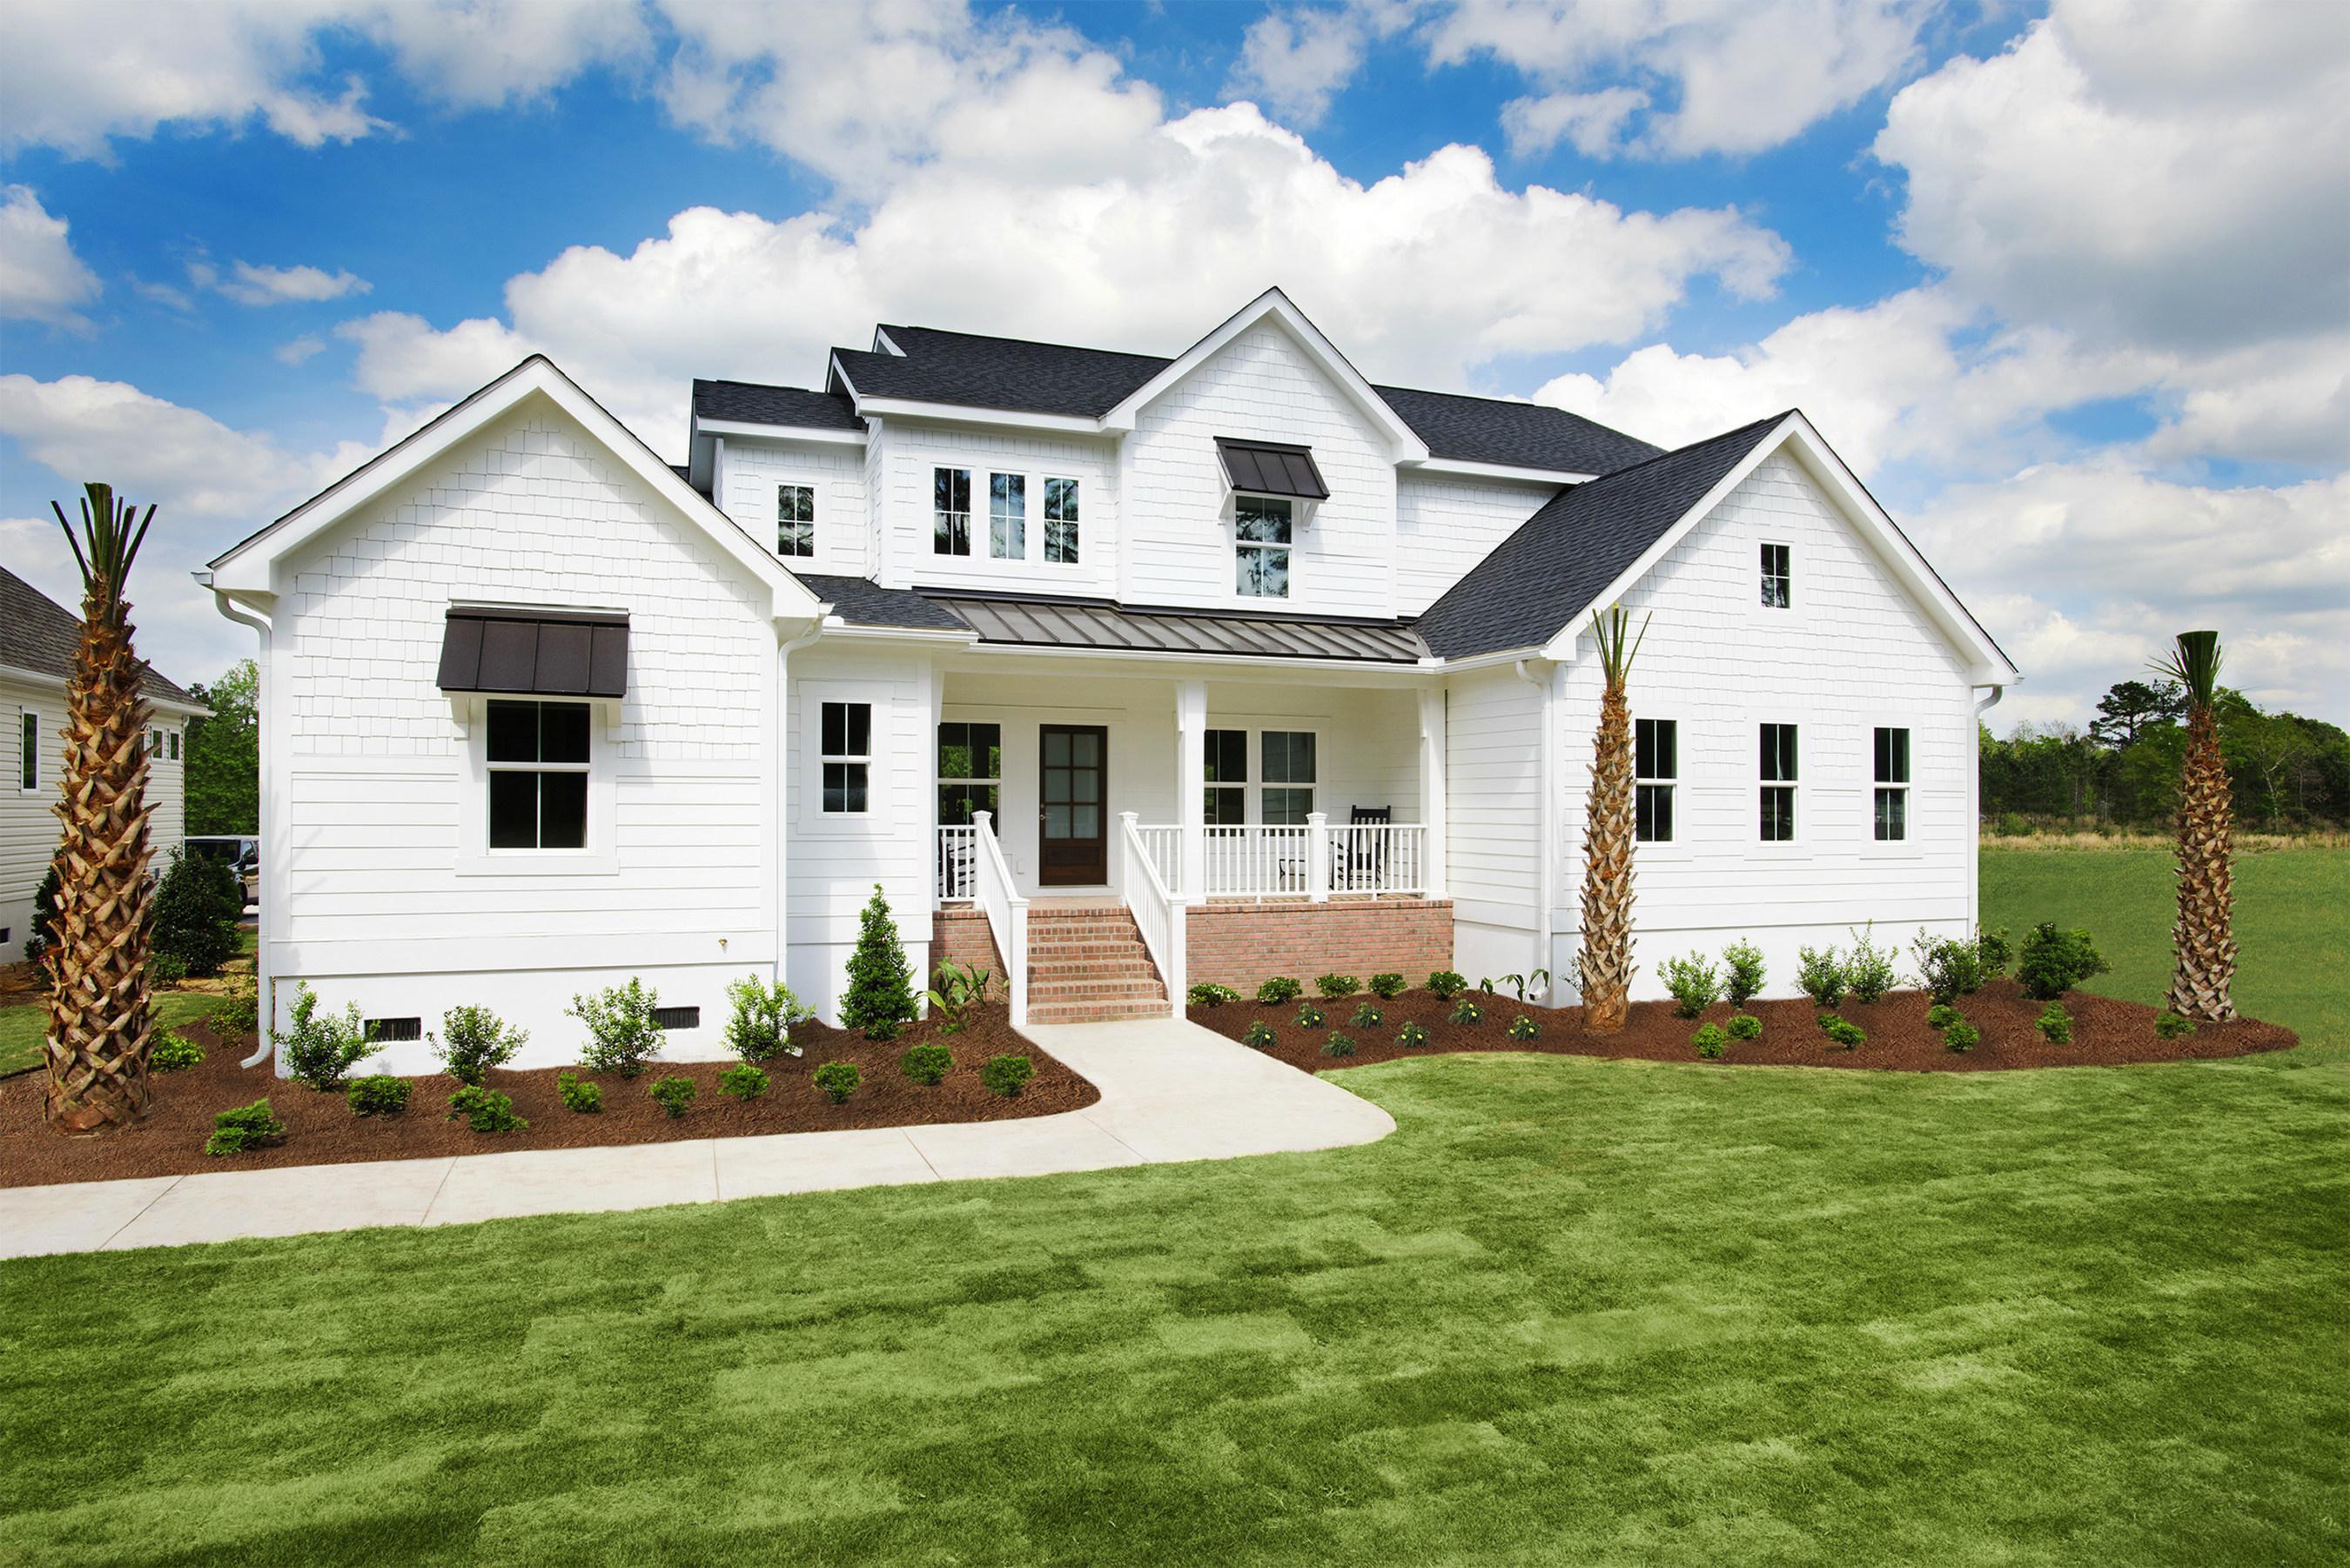 Custom Home Builder Schumacher Homes Opens New Model Home and Design on arkansas home, missouri home, north carolina home, wa state home, south carolina home, nevada home, wisconsin home, idaho home, maryland home, alabama home, virginia home, indiana home,